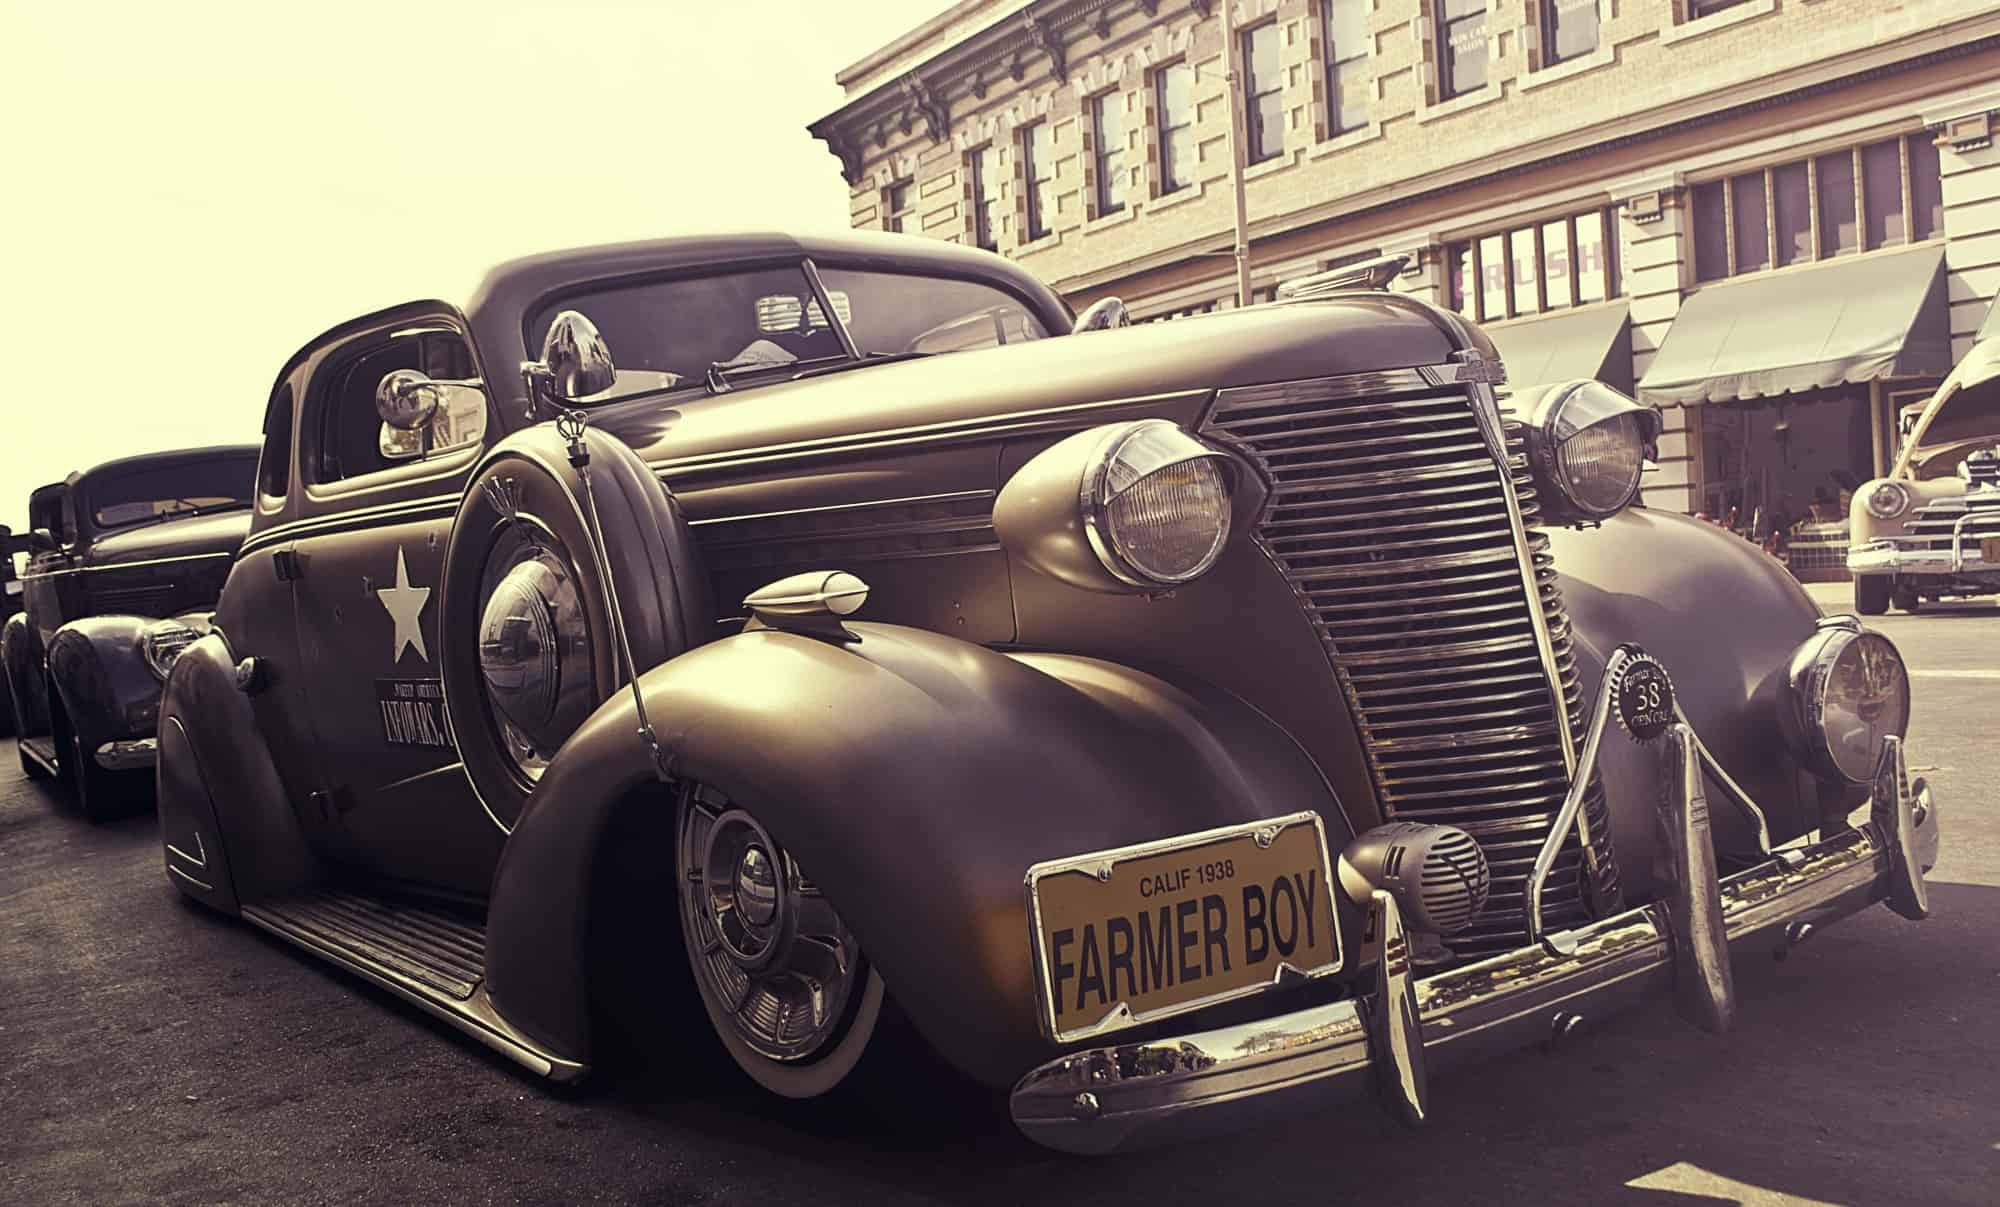 vintage car with farmer boy license plates